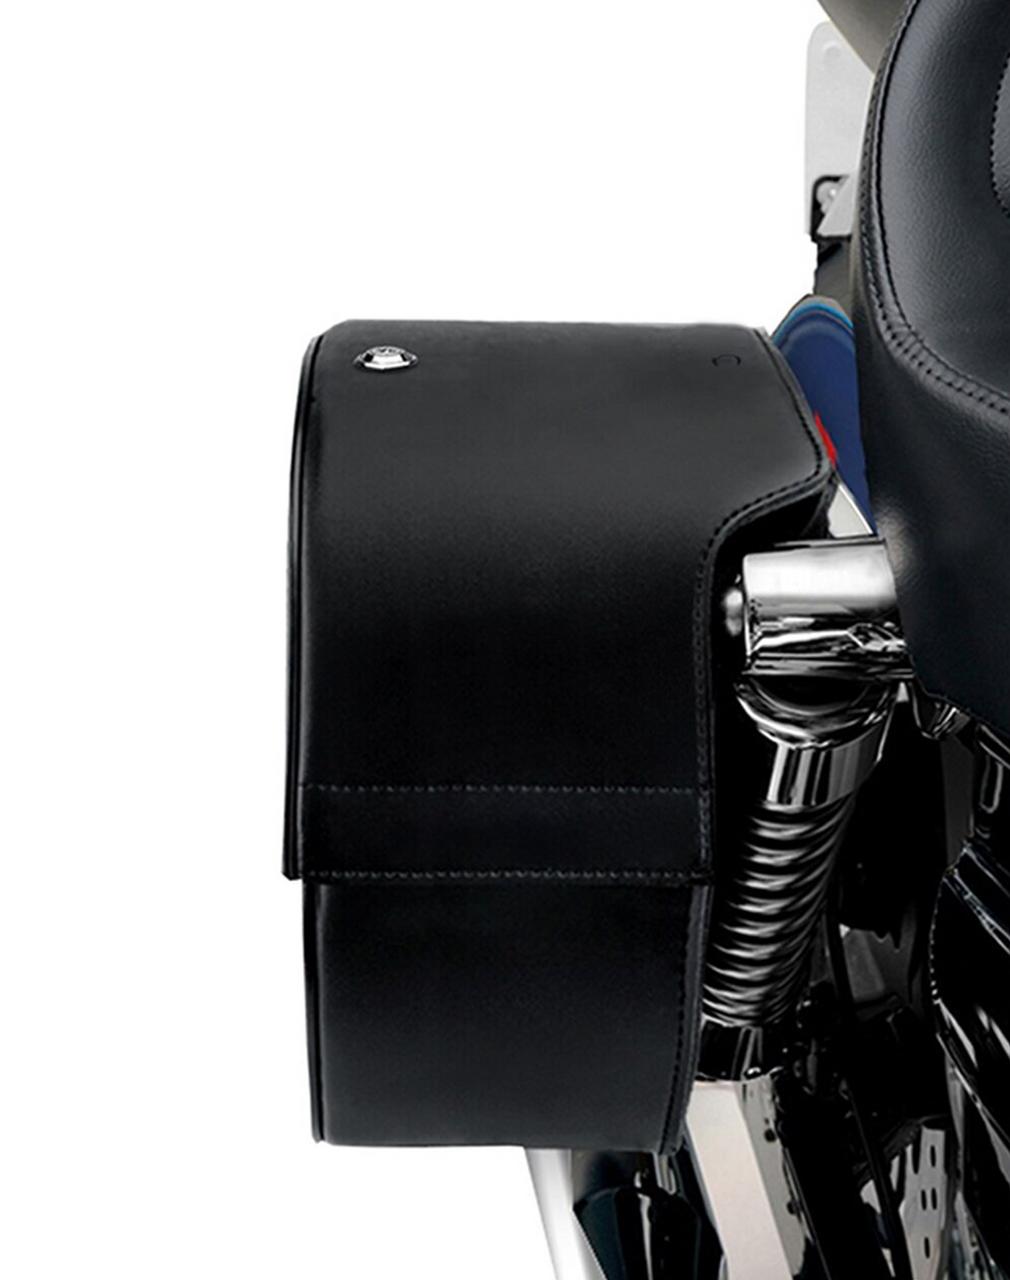 Honda VTX 1300 C Large Shock Cutout Warrior Slanted Motorcycle Saddlebags Shock Cutout View